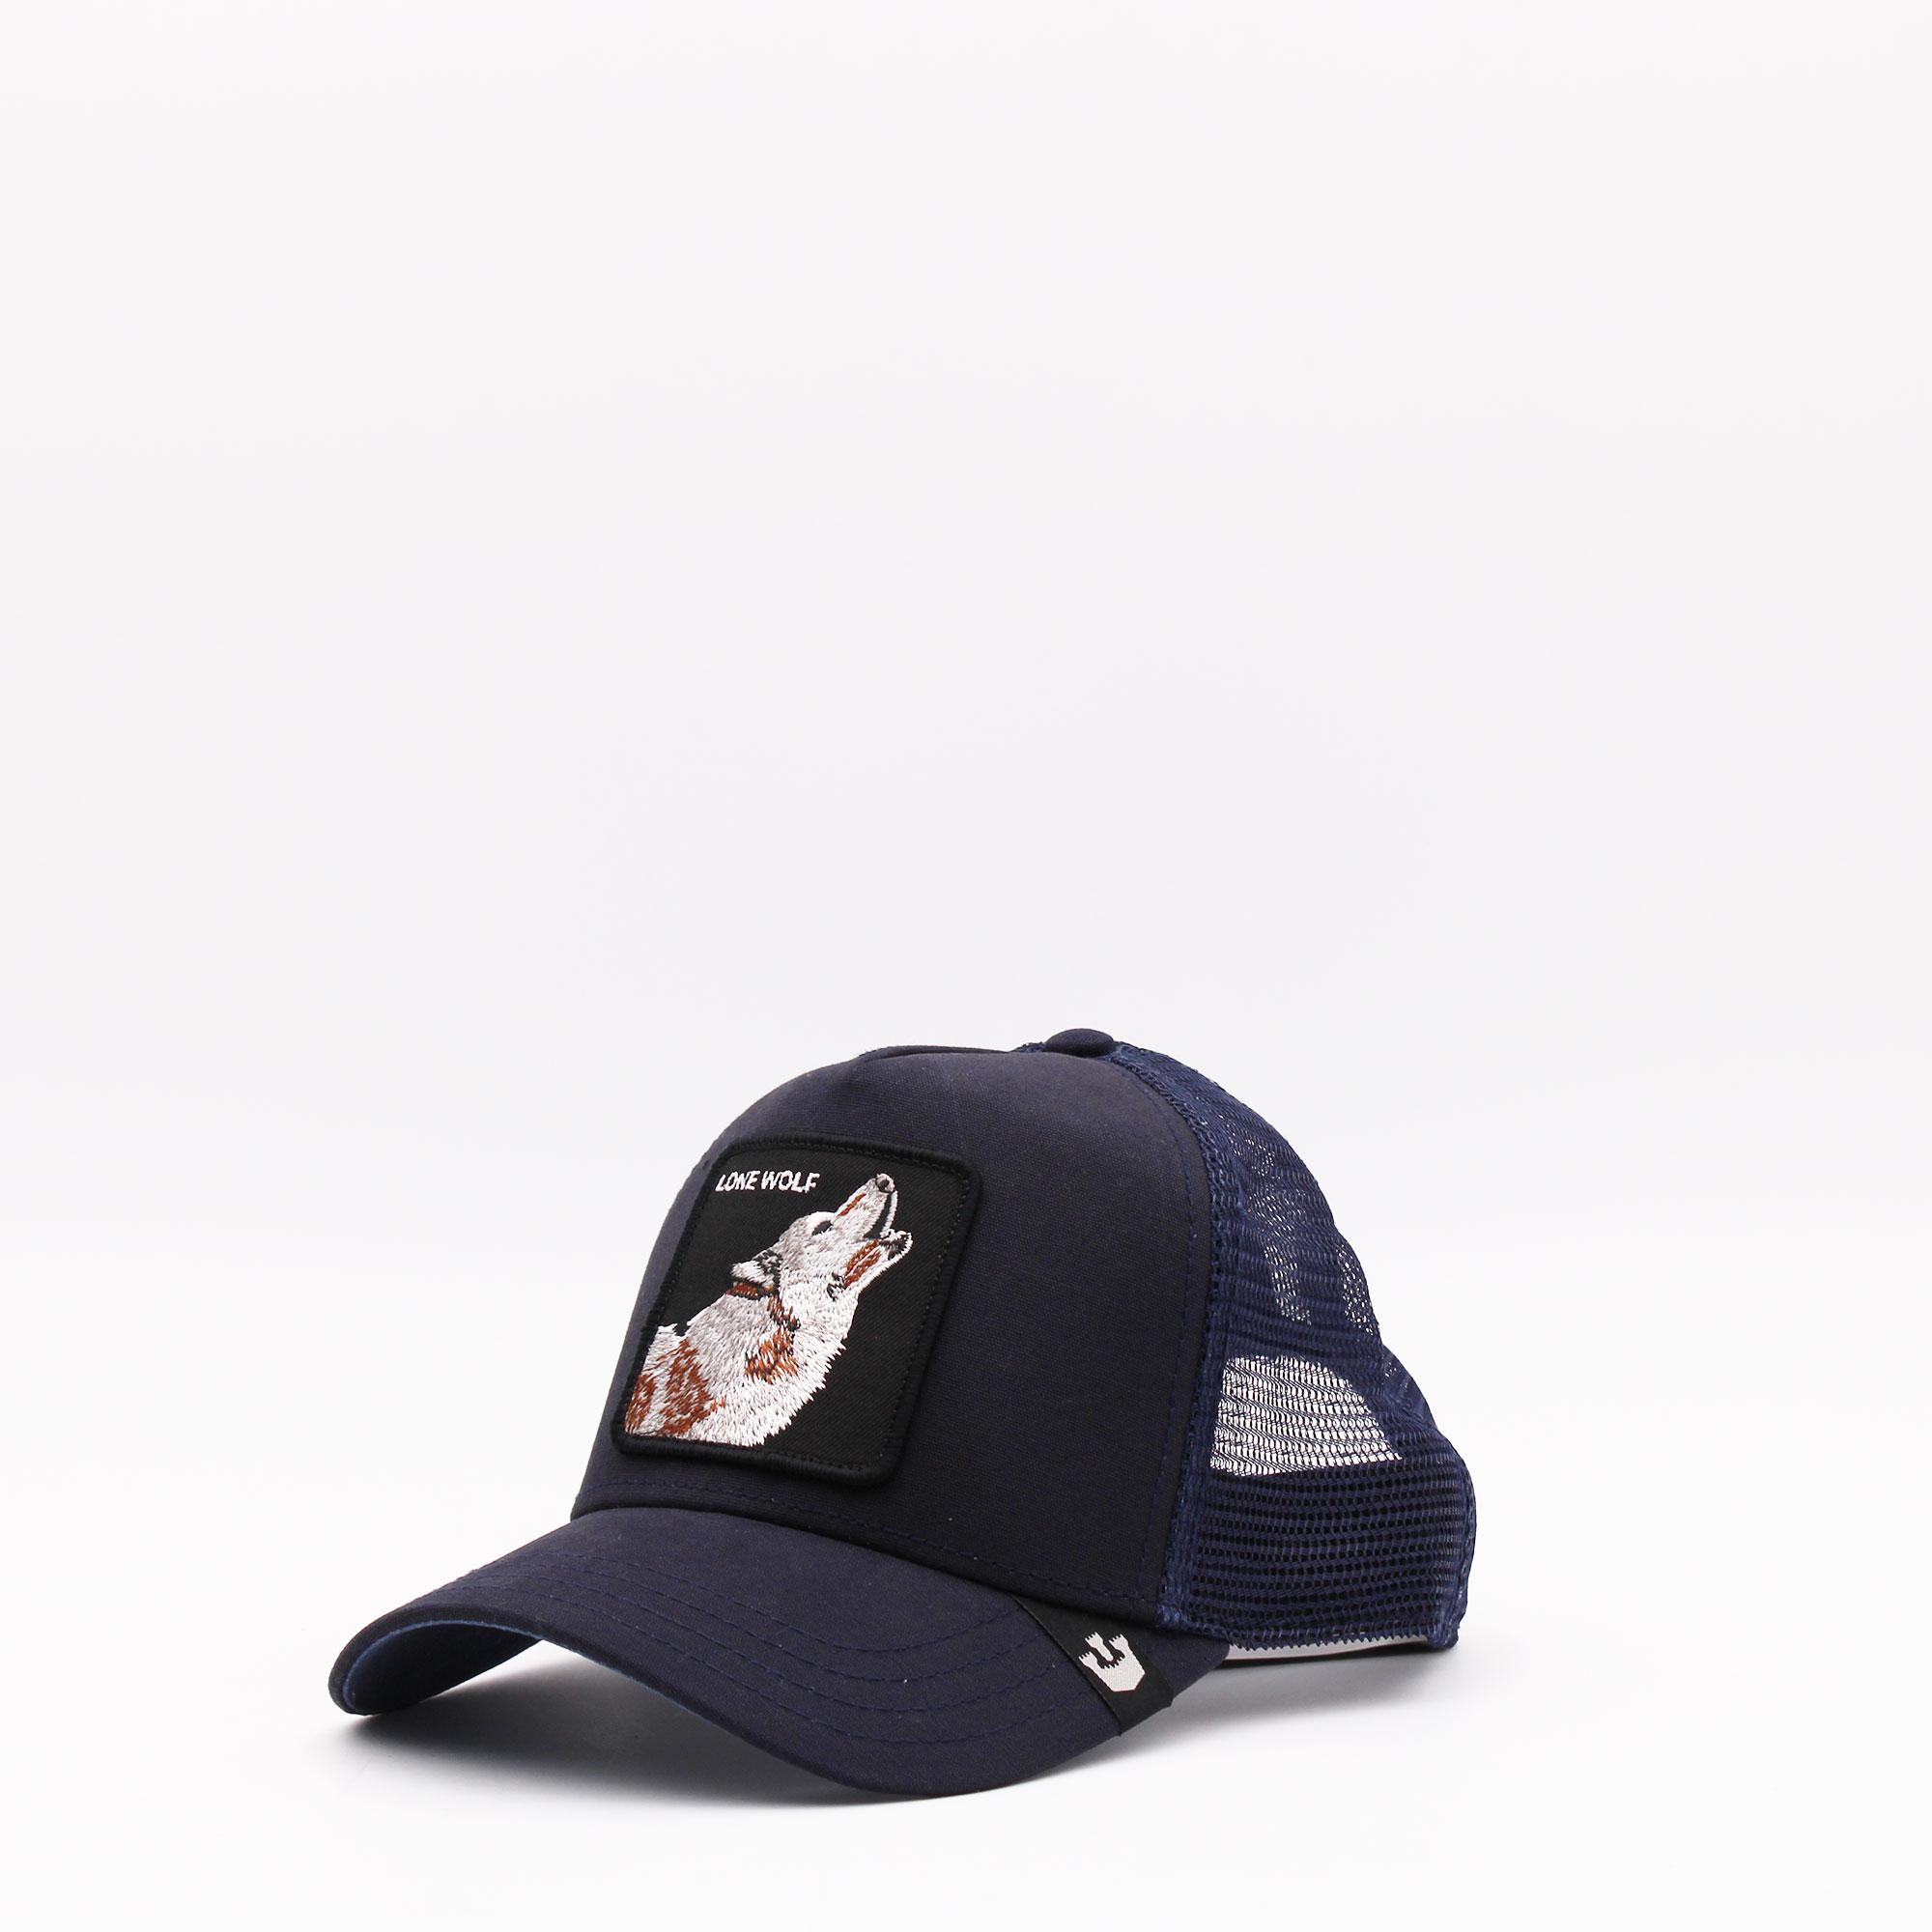 Cappello baseball lone wolf - Blu